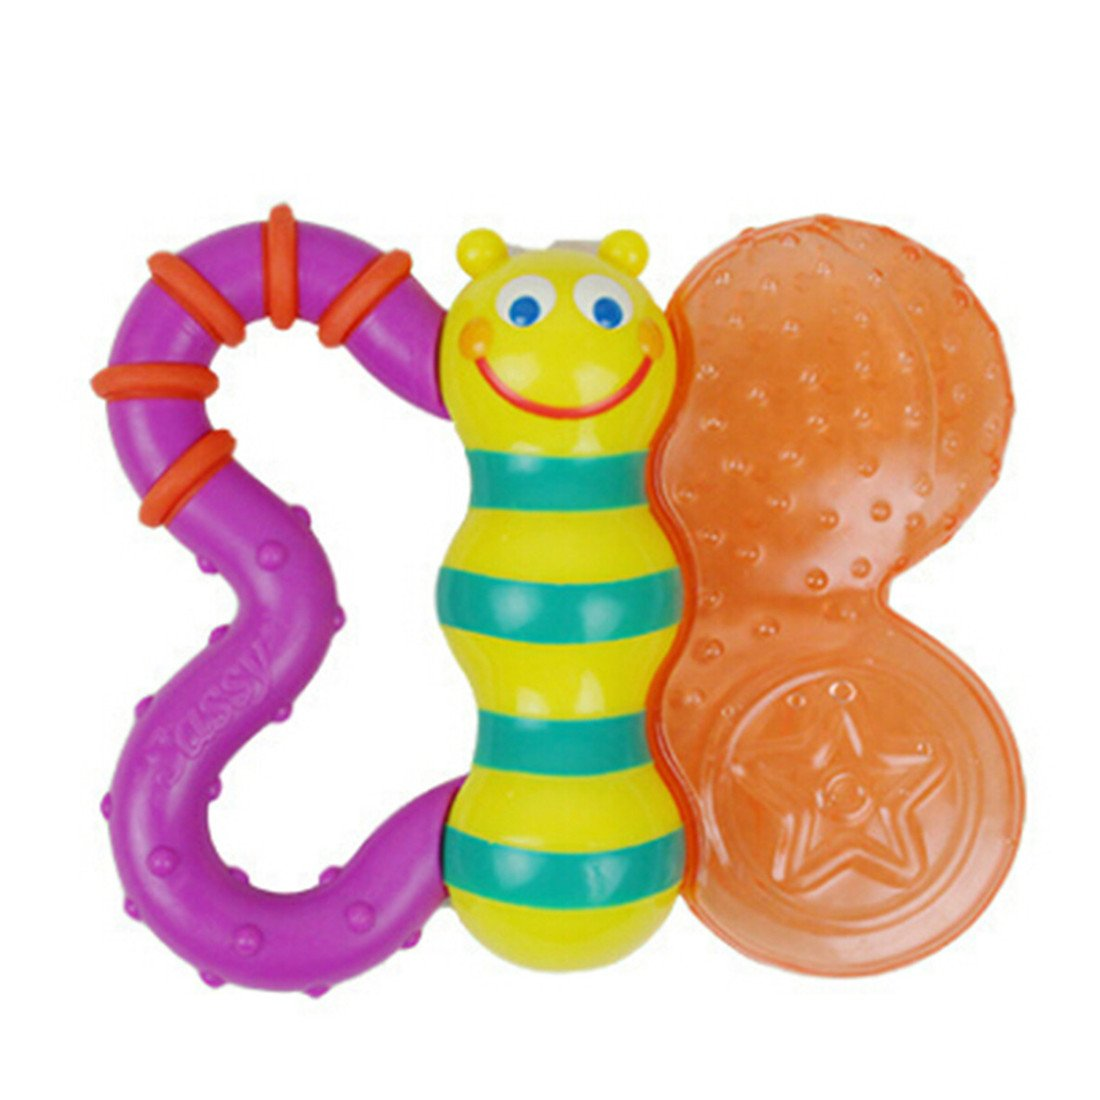 EdtoyカラフルBee赤ちゃん早期教育Toys Rattles柔らかい布手Ringing Toy   B074C569LT